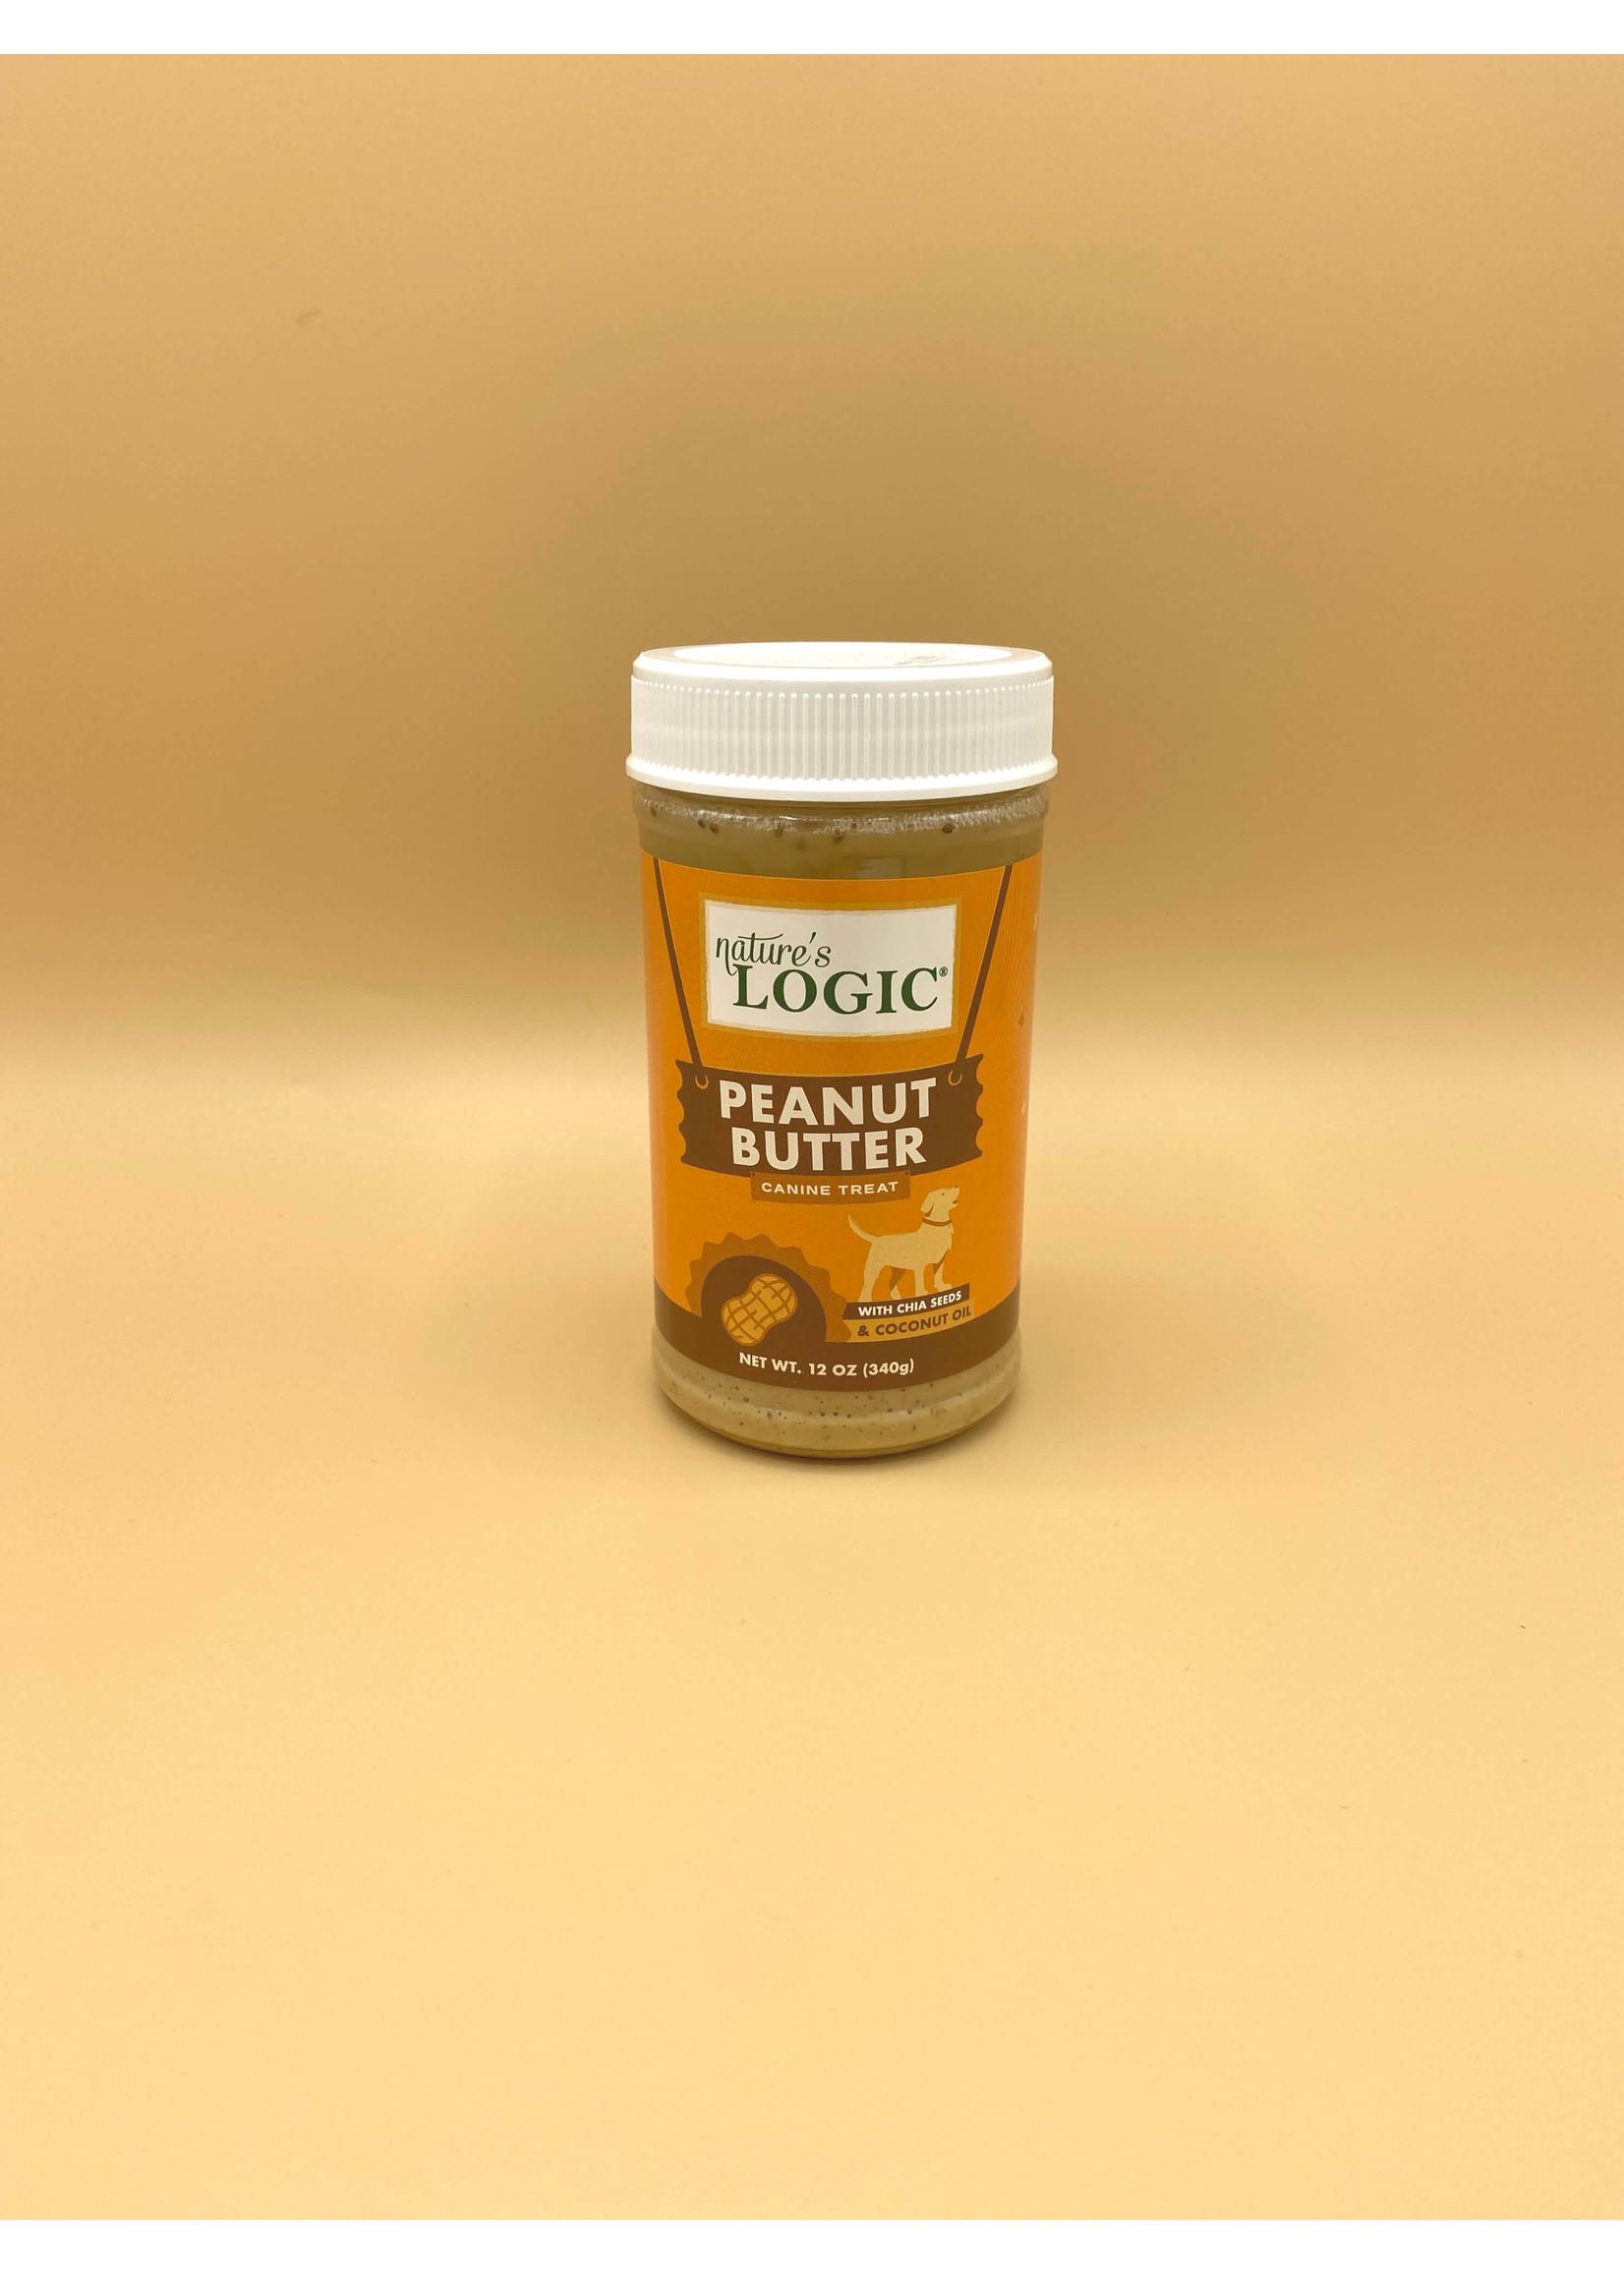 Nature's Logic Nature's Logic 12oz Peanut Butter